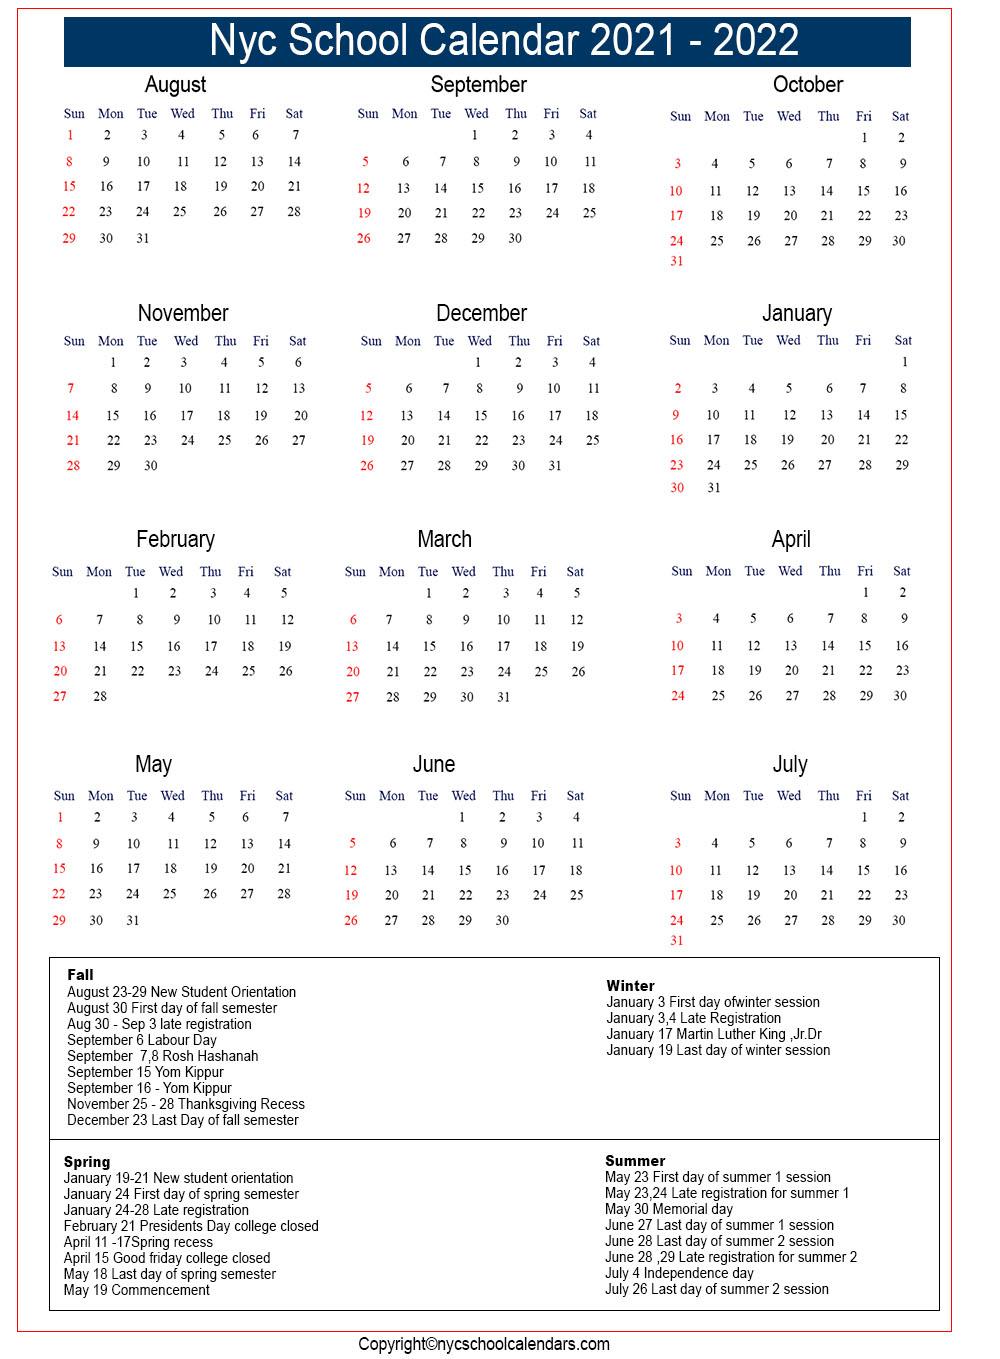 Nyc School Calendar 2021 ✅❤️ Regarding Central Islip School District Calendar